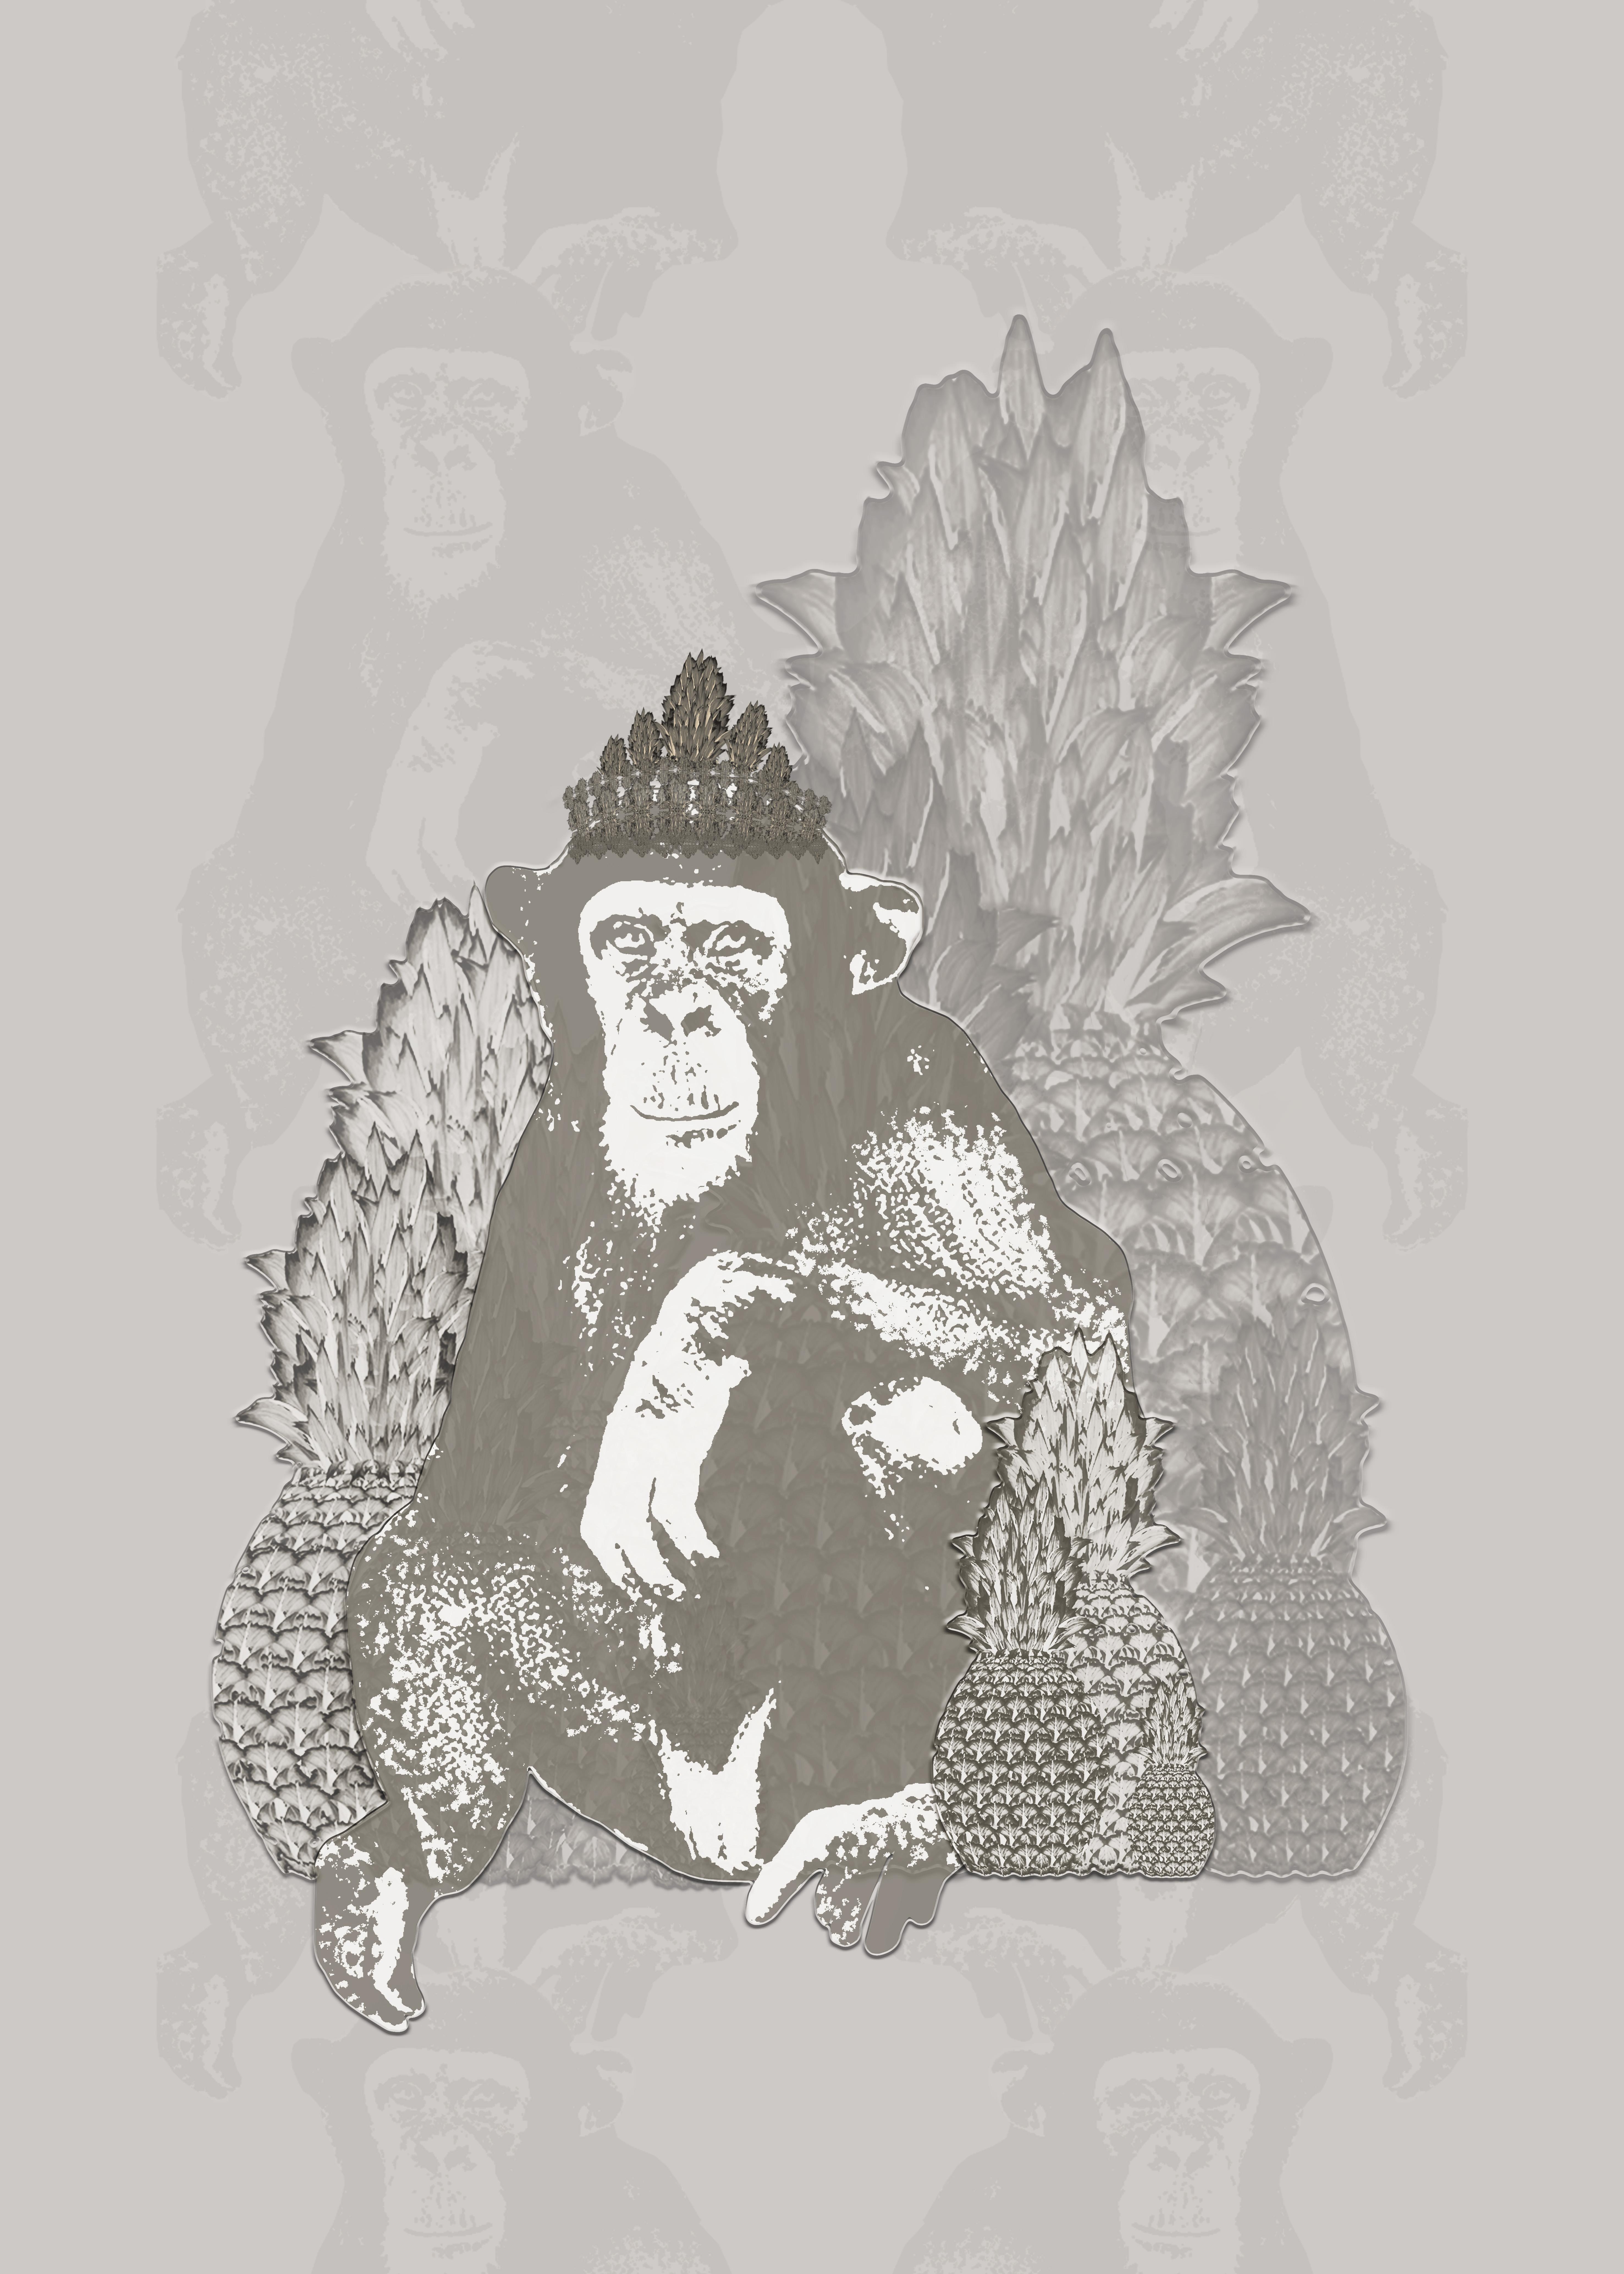 DEAR KING